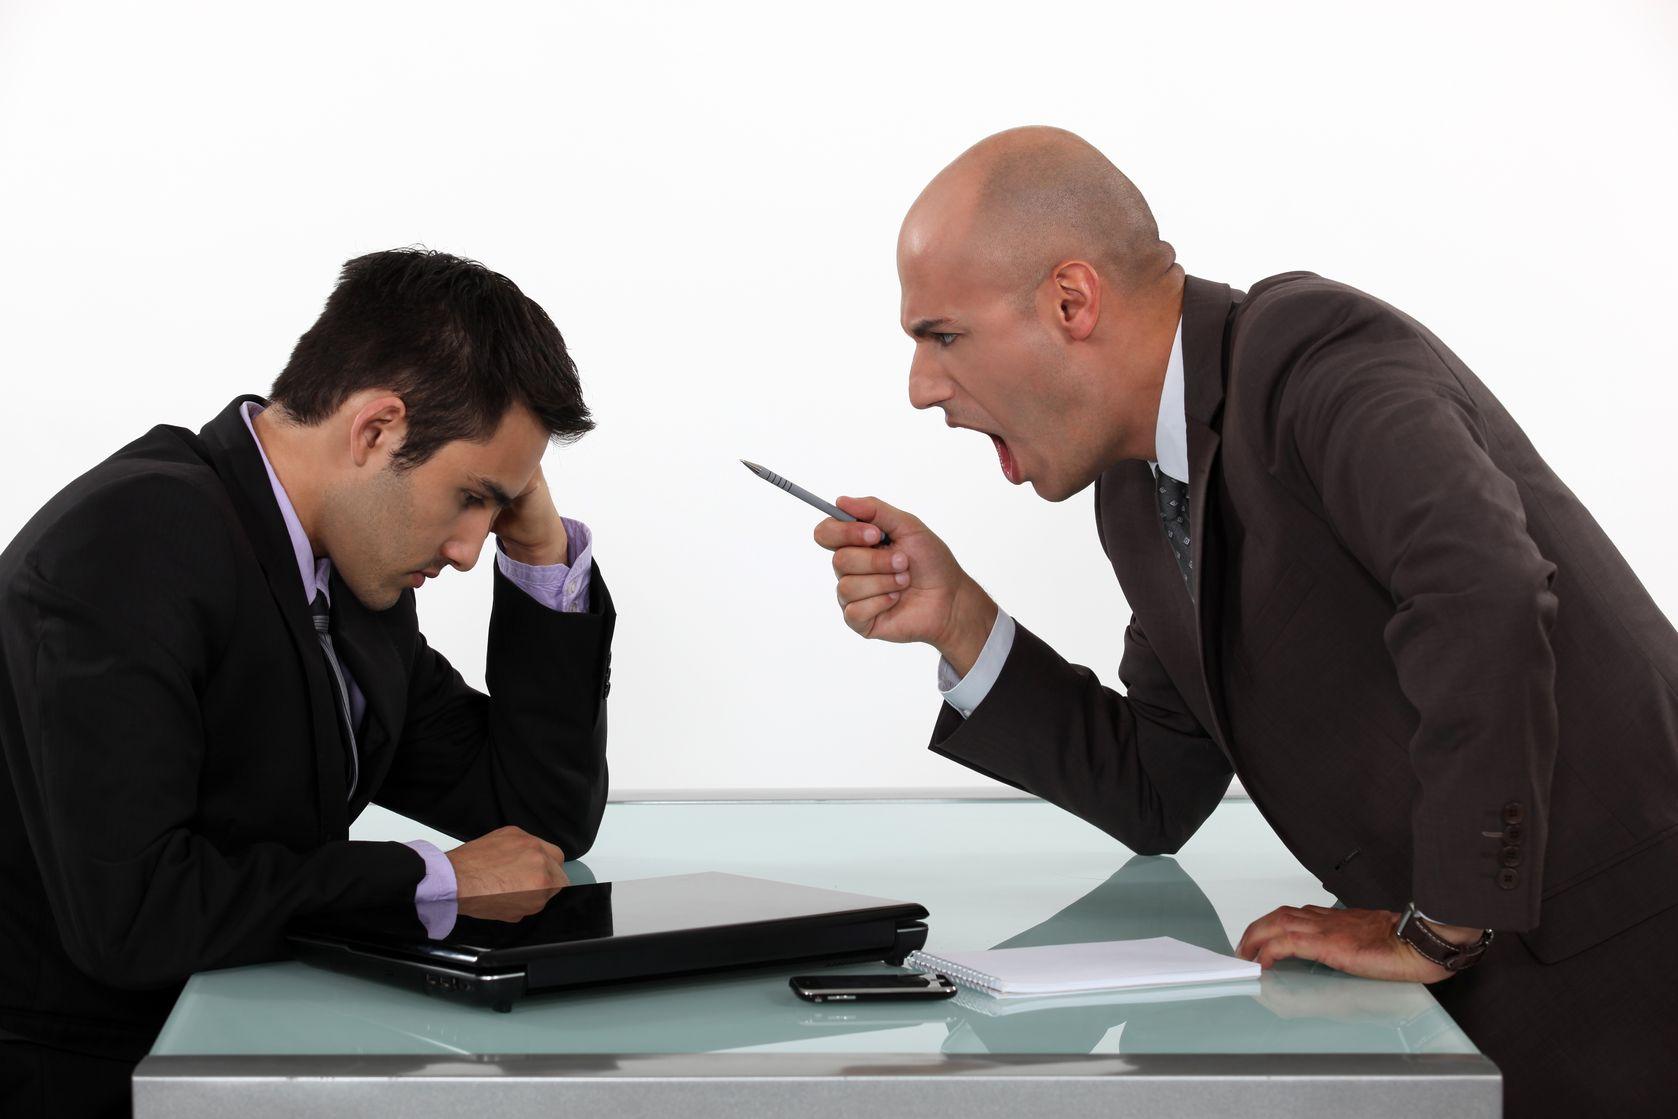 insurance, horst insurance, workplace harassment, employer liability, harassment by supervisors, office harassment, sexual harassment